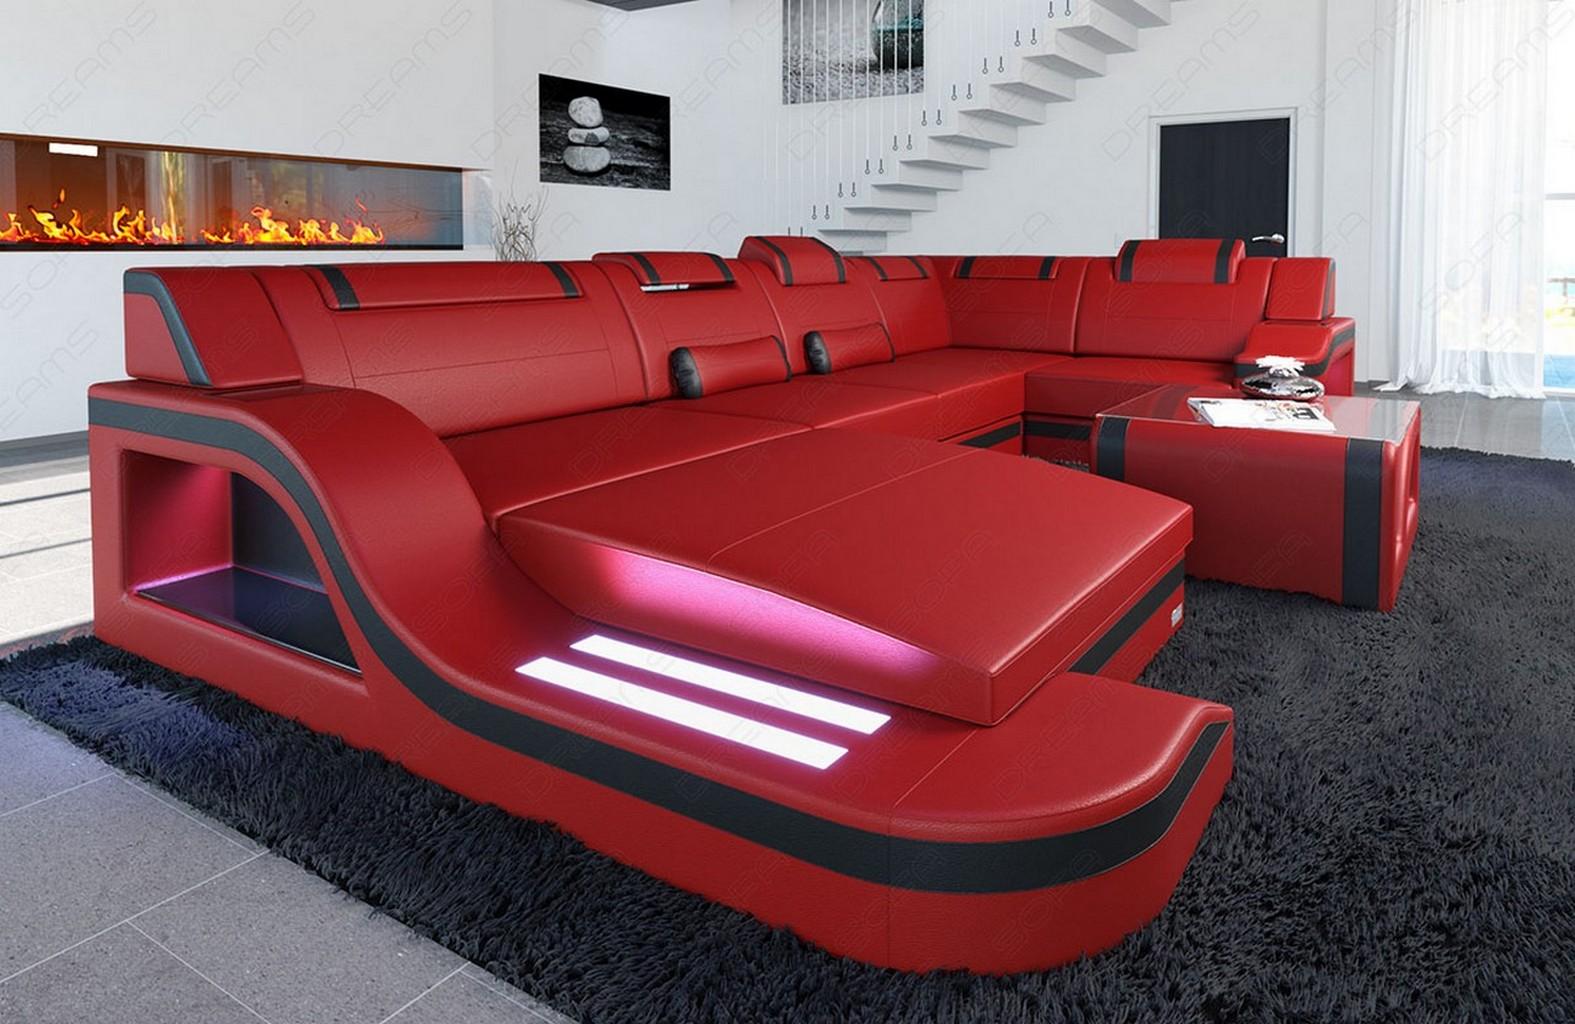 Designsofa palermo in u form mit led beleuchtung mega sofa for Wohnlandschaft rot schwarz